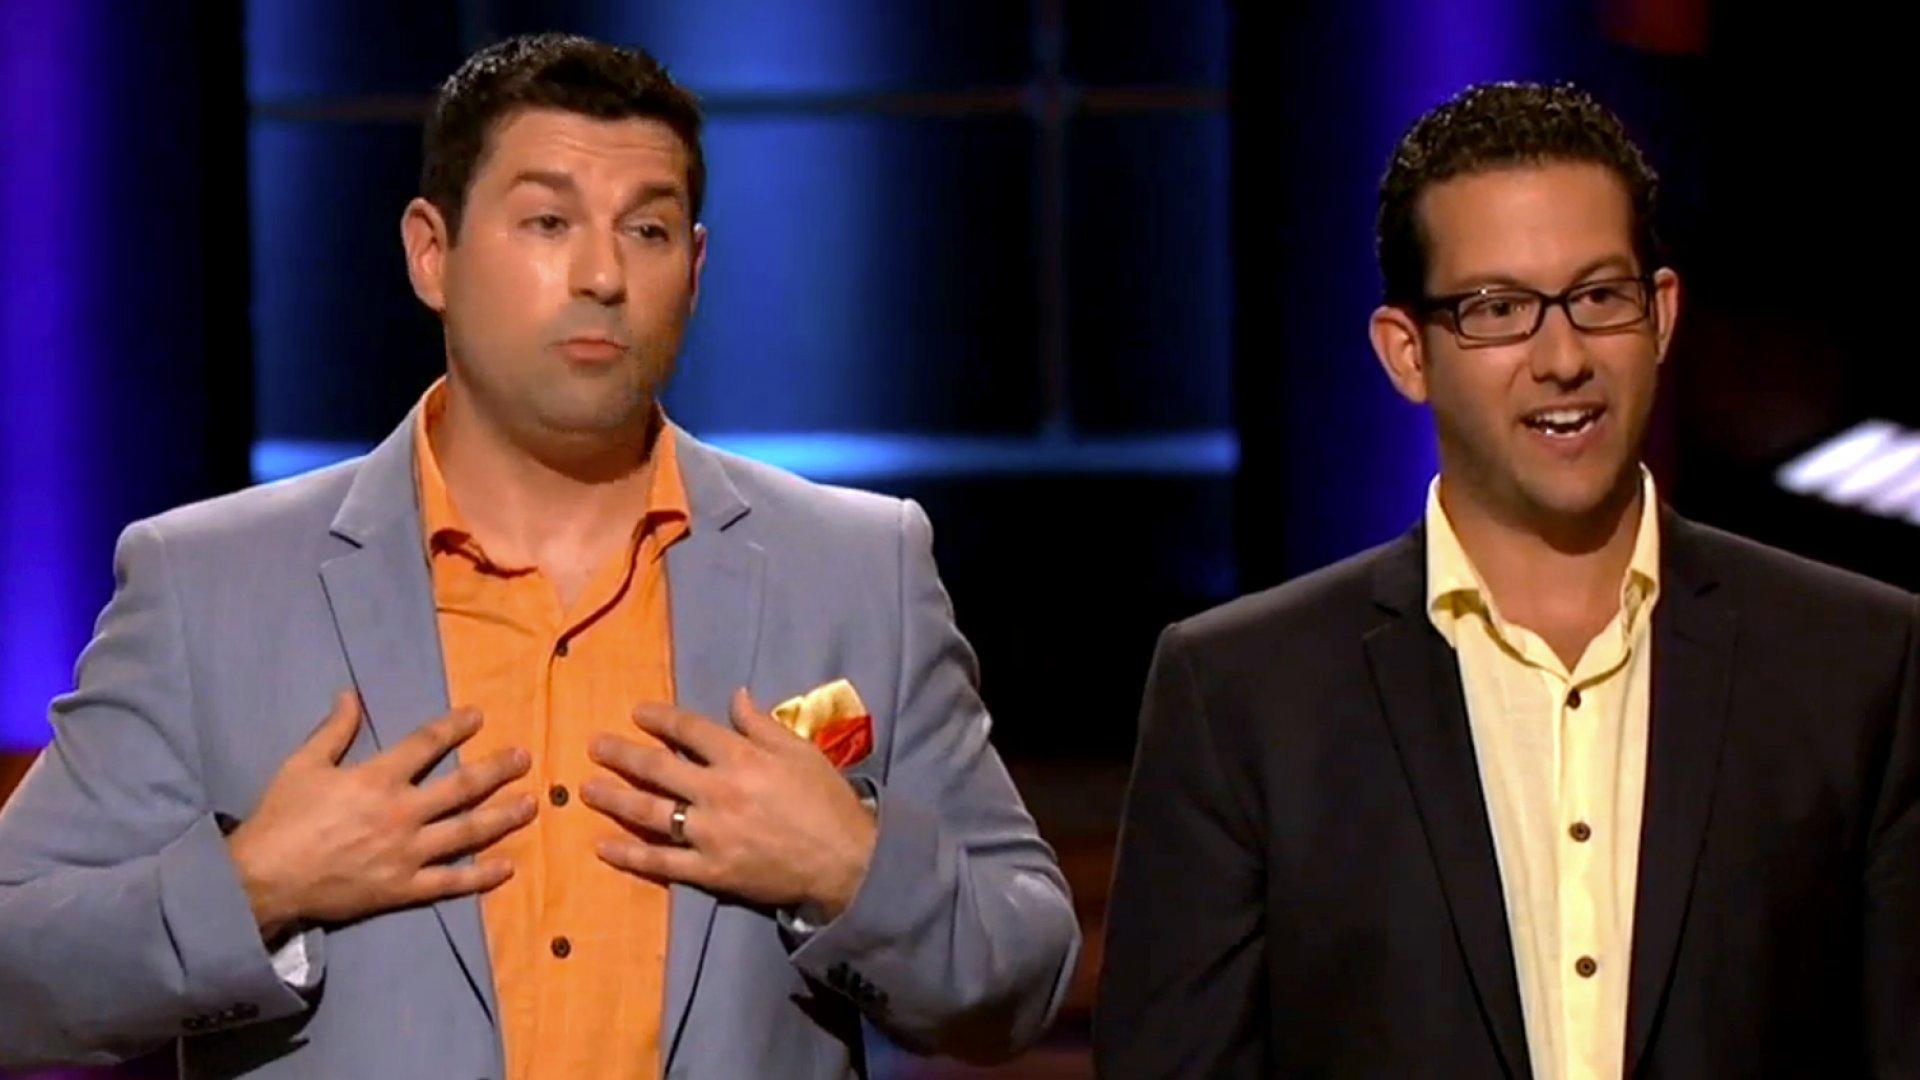 Sunscreen Mist Founder and President Tony Fayne (left) and CEO Josh Kaplan